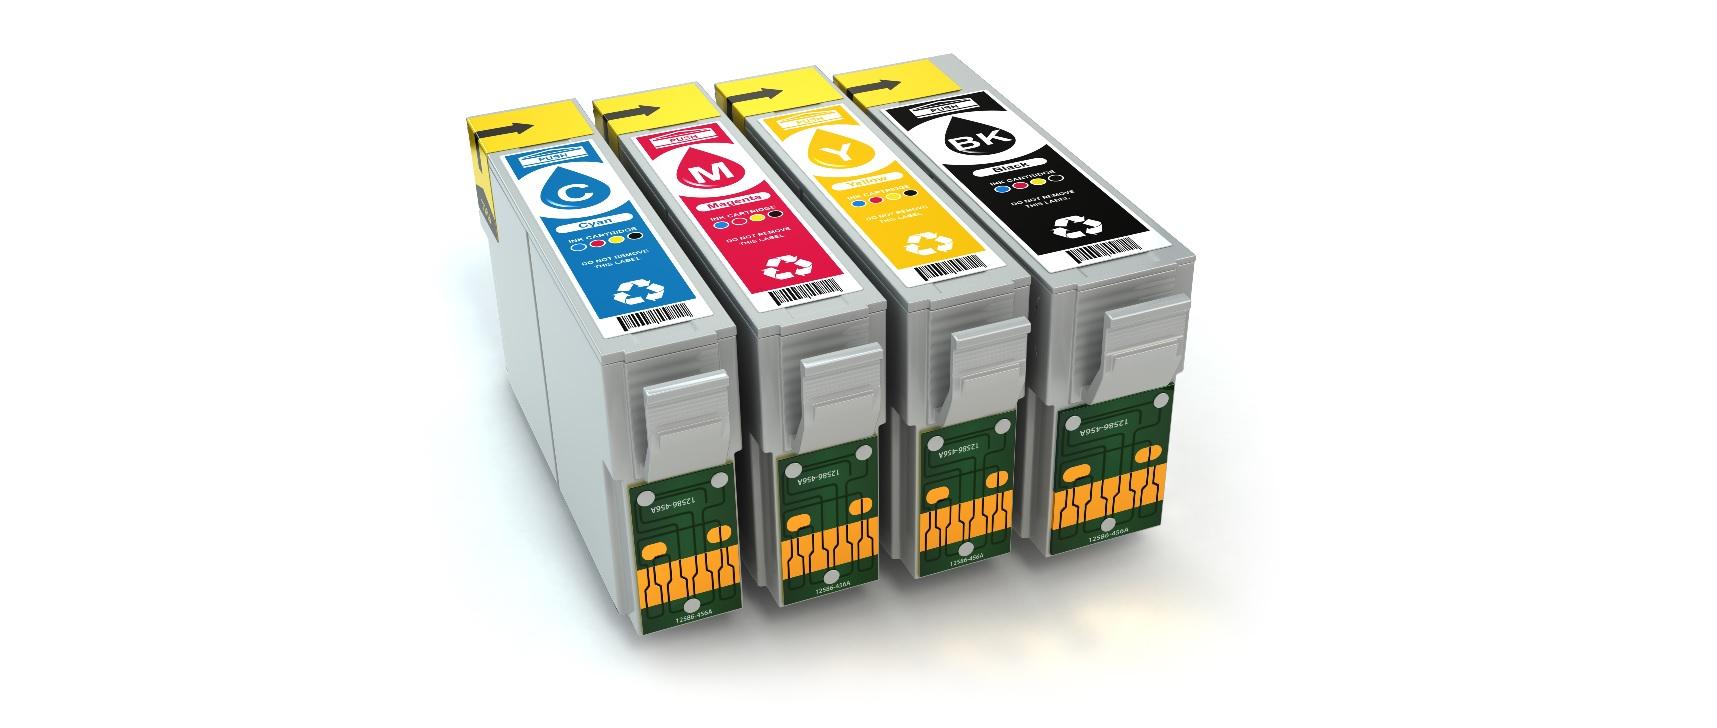 How to reset ink cartridge epson reset tool